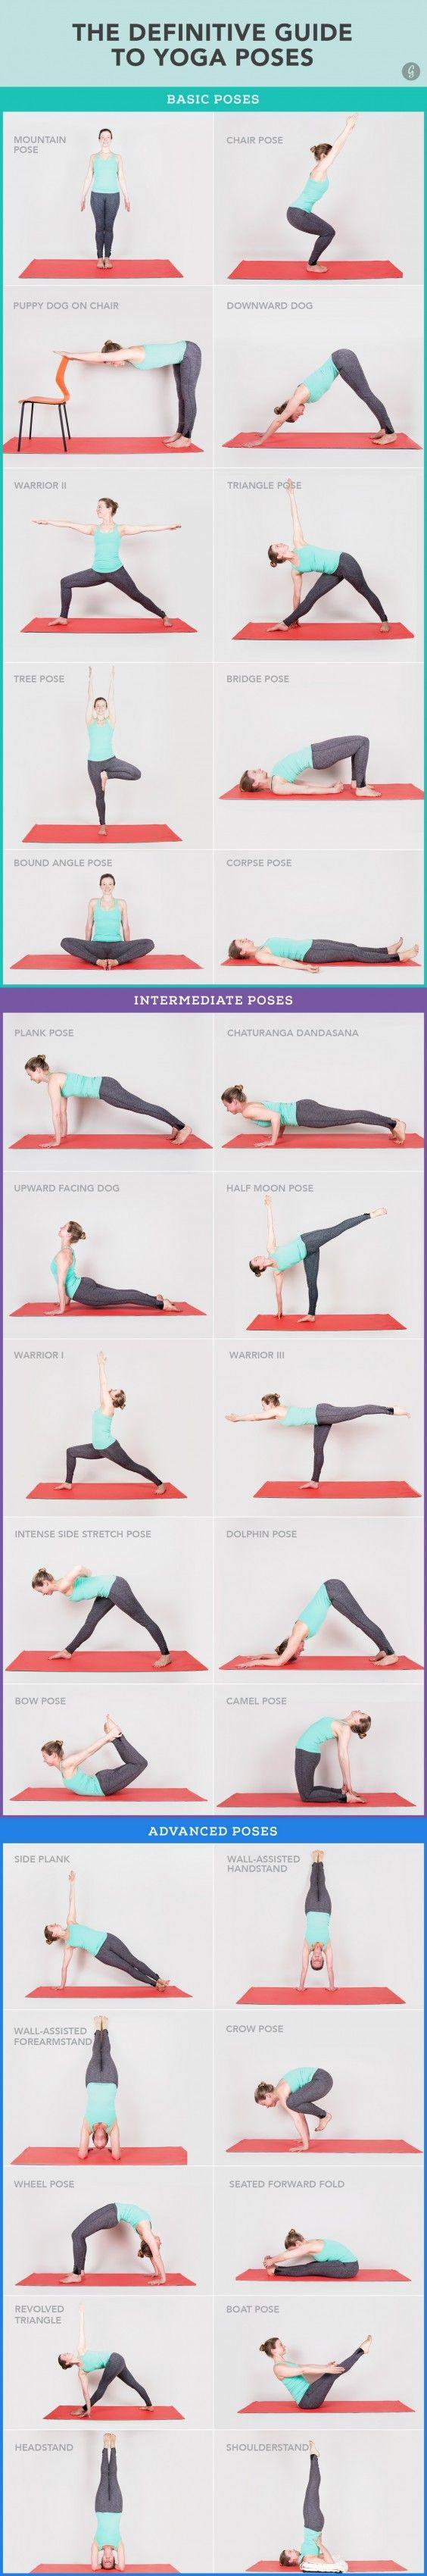 ☆ YOGA POSES ☆:  30 Yoga Poses You Really Need To Know.